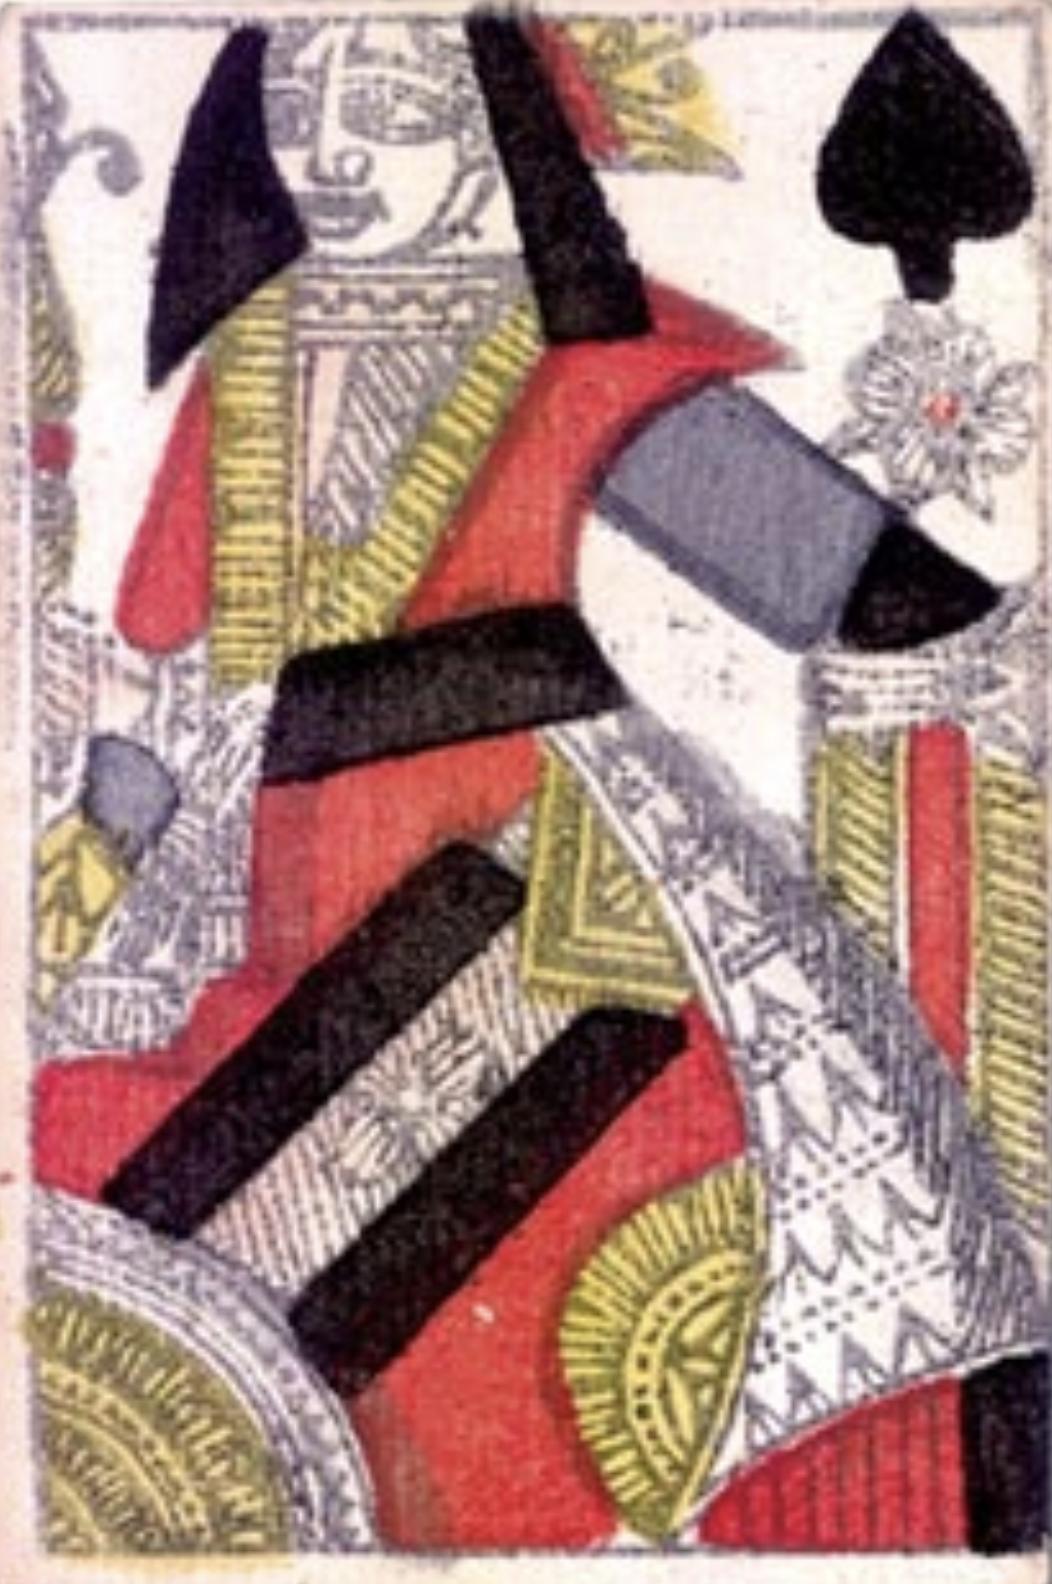 Gibson, c. 1770